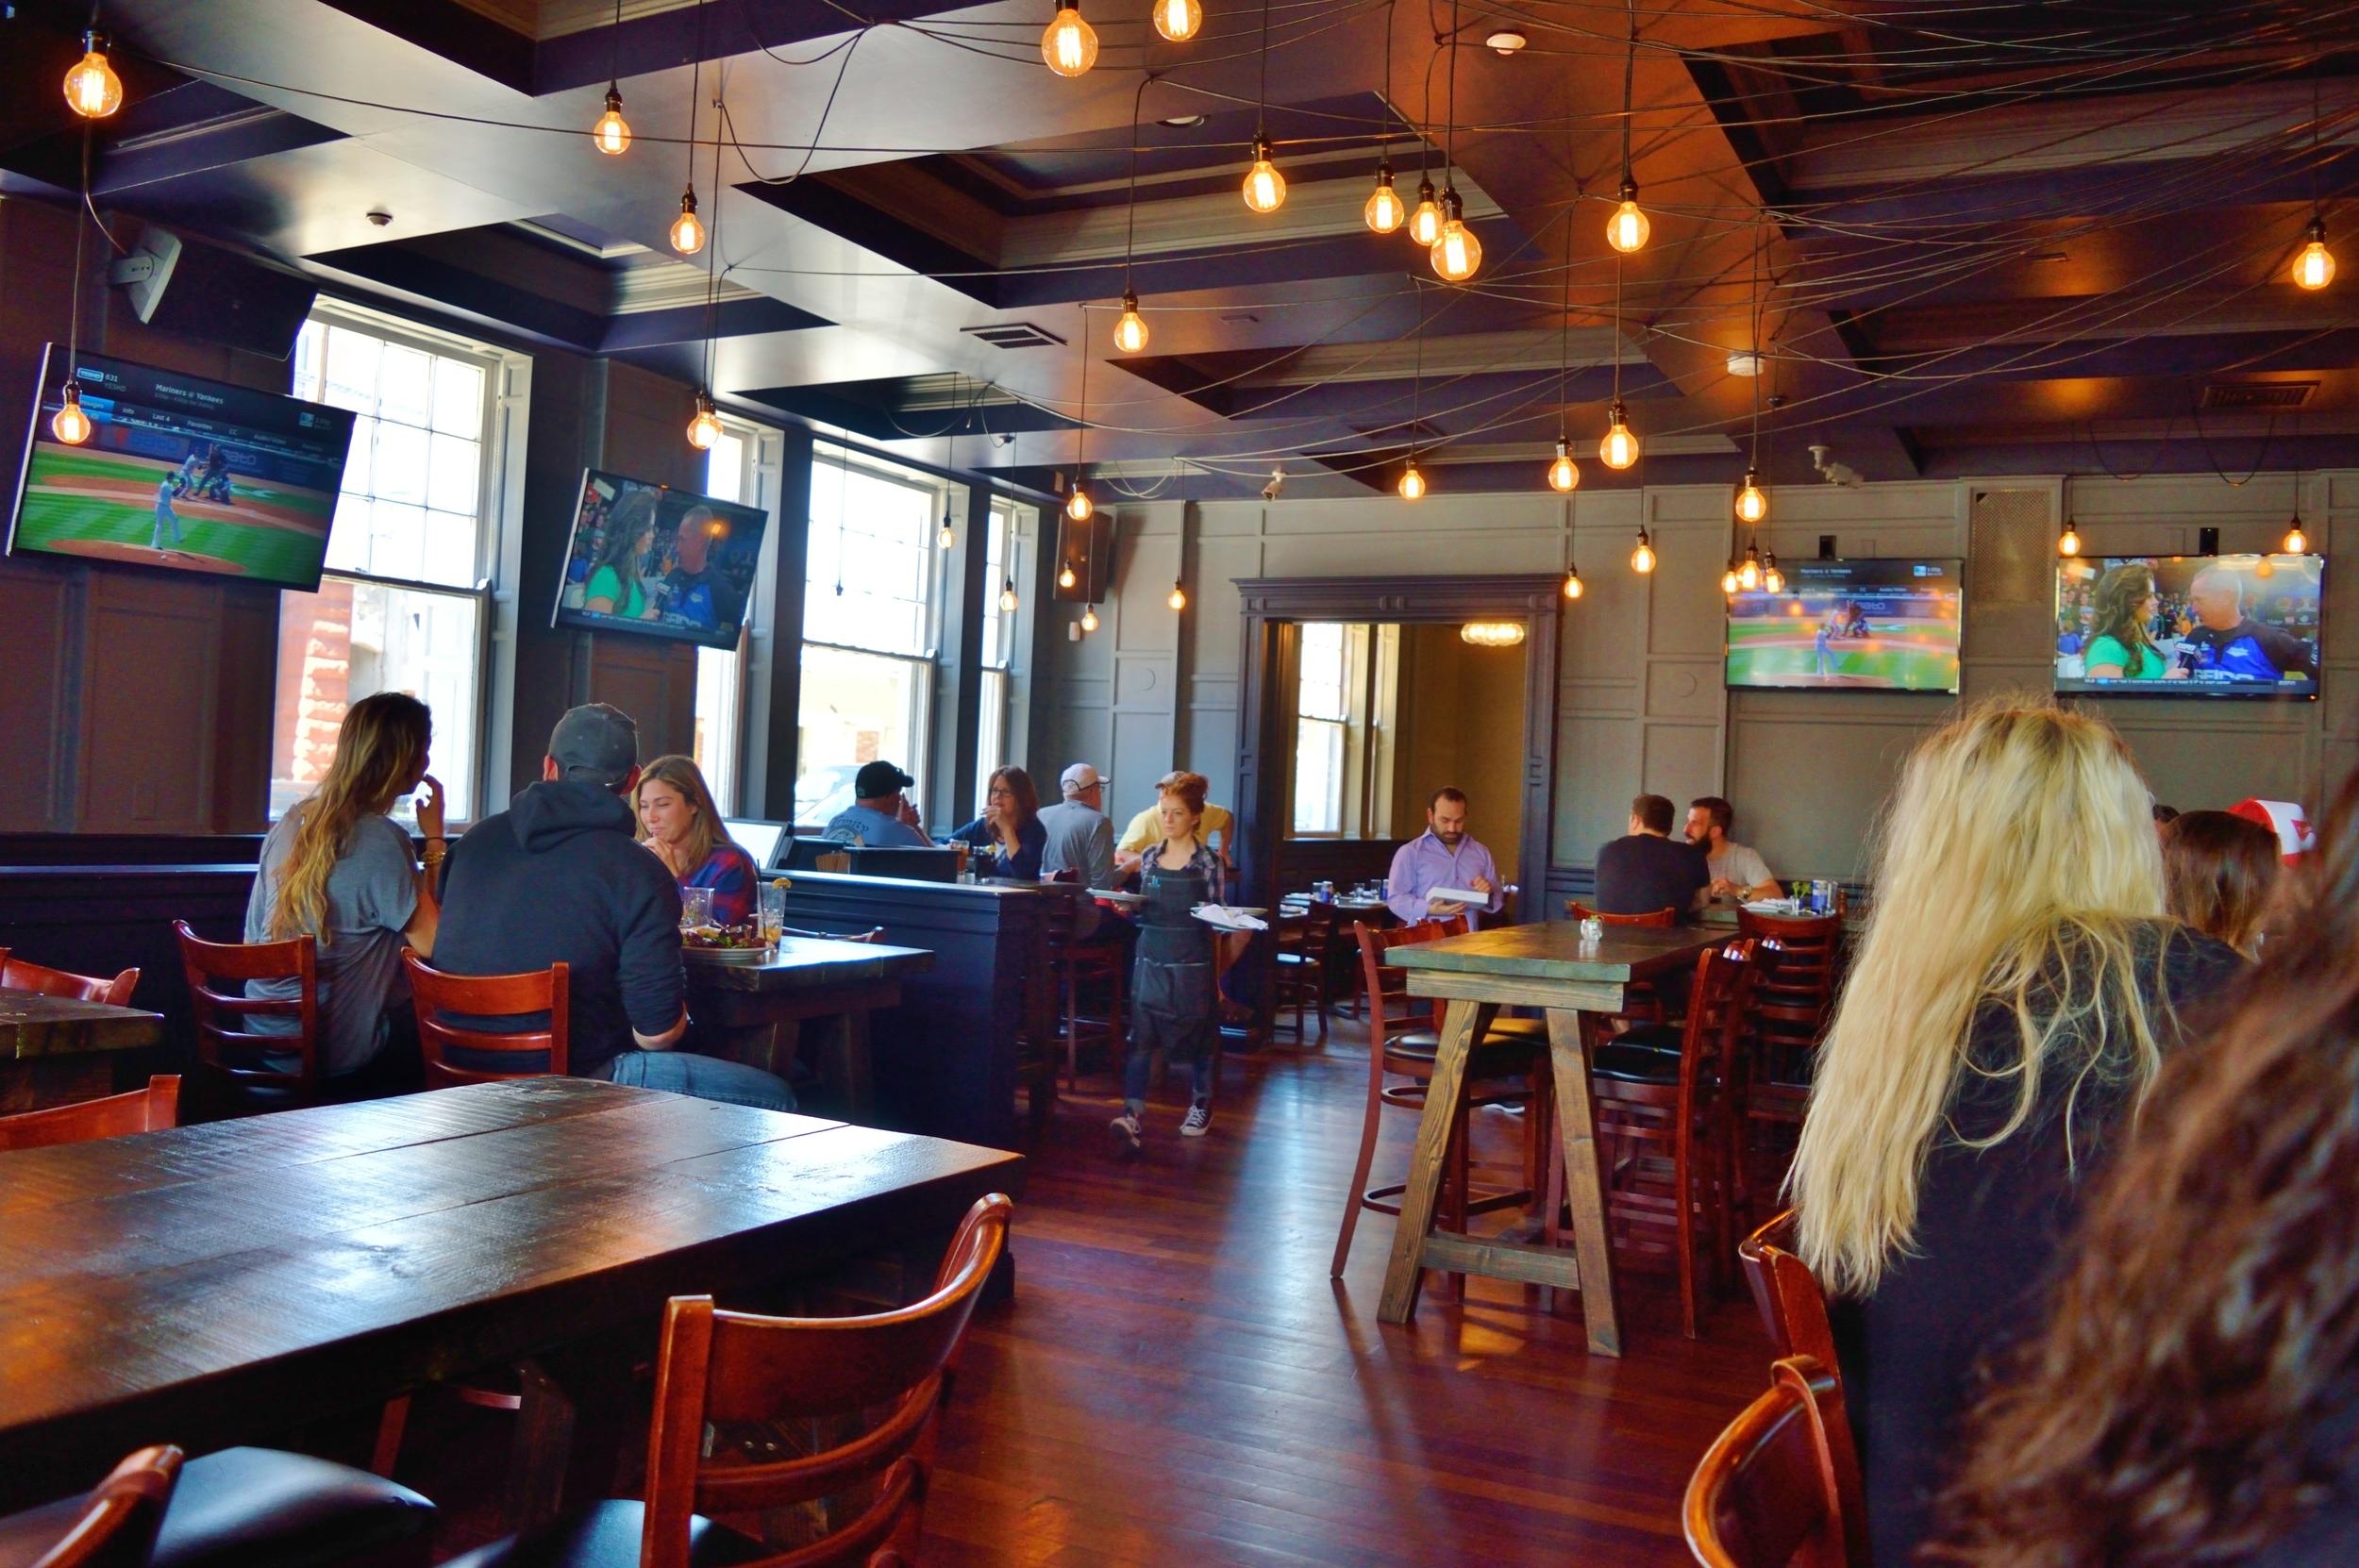 The bar dining area has a nice vibrant motif.